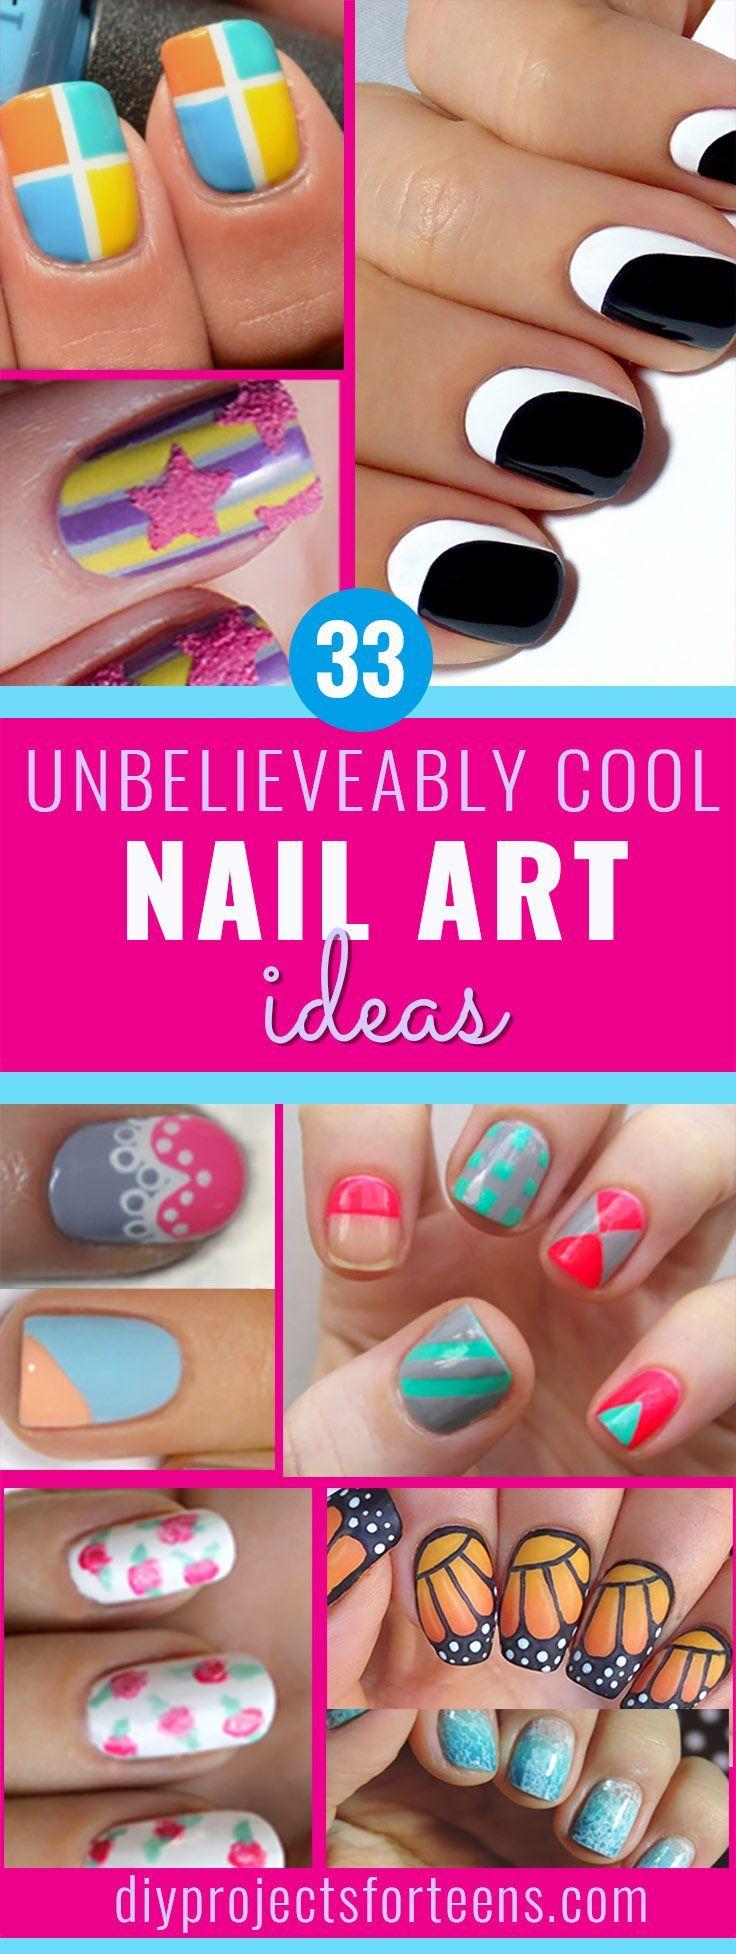 79 best Nail Art for Teens images on Pinterest   Design tutorials ...